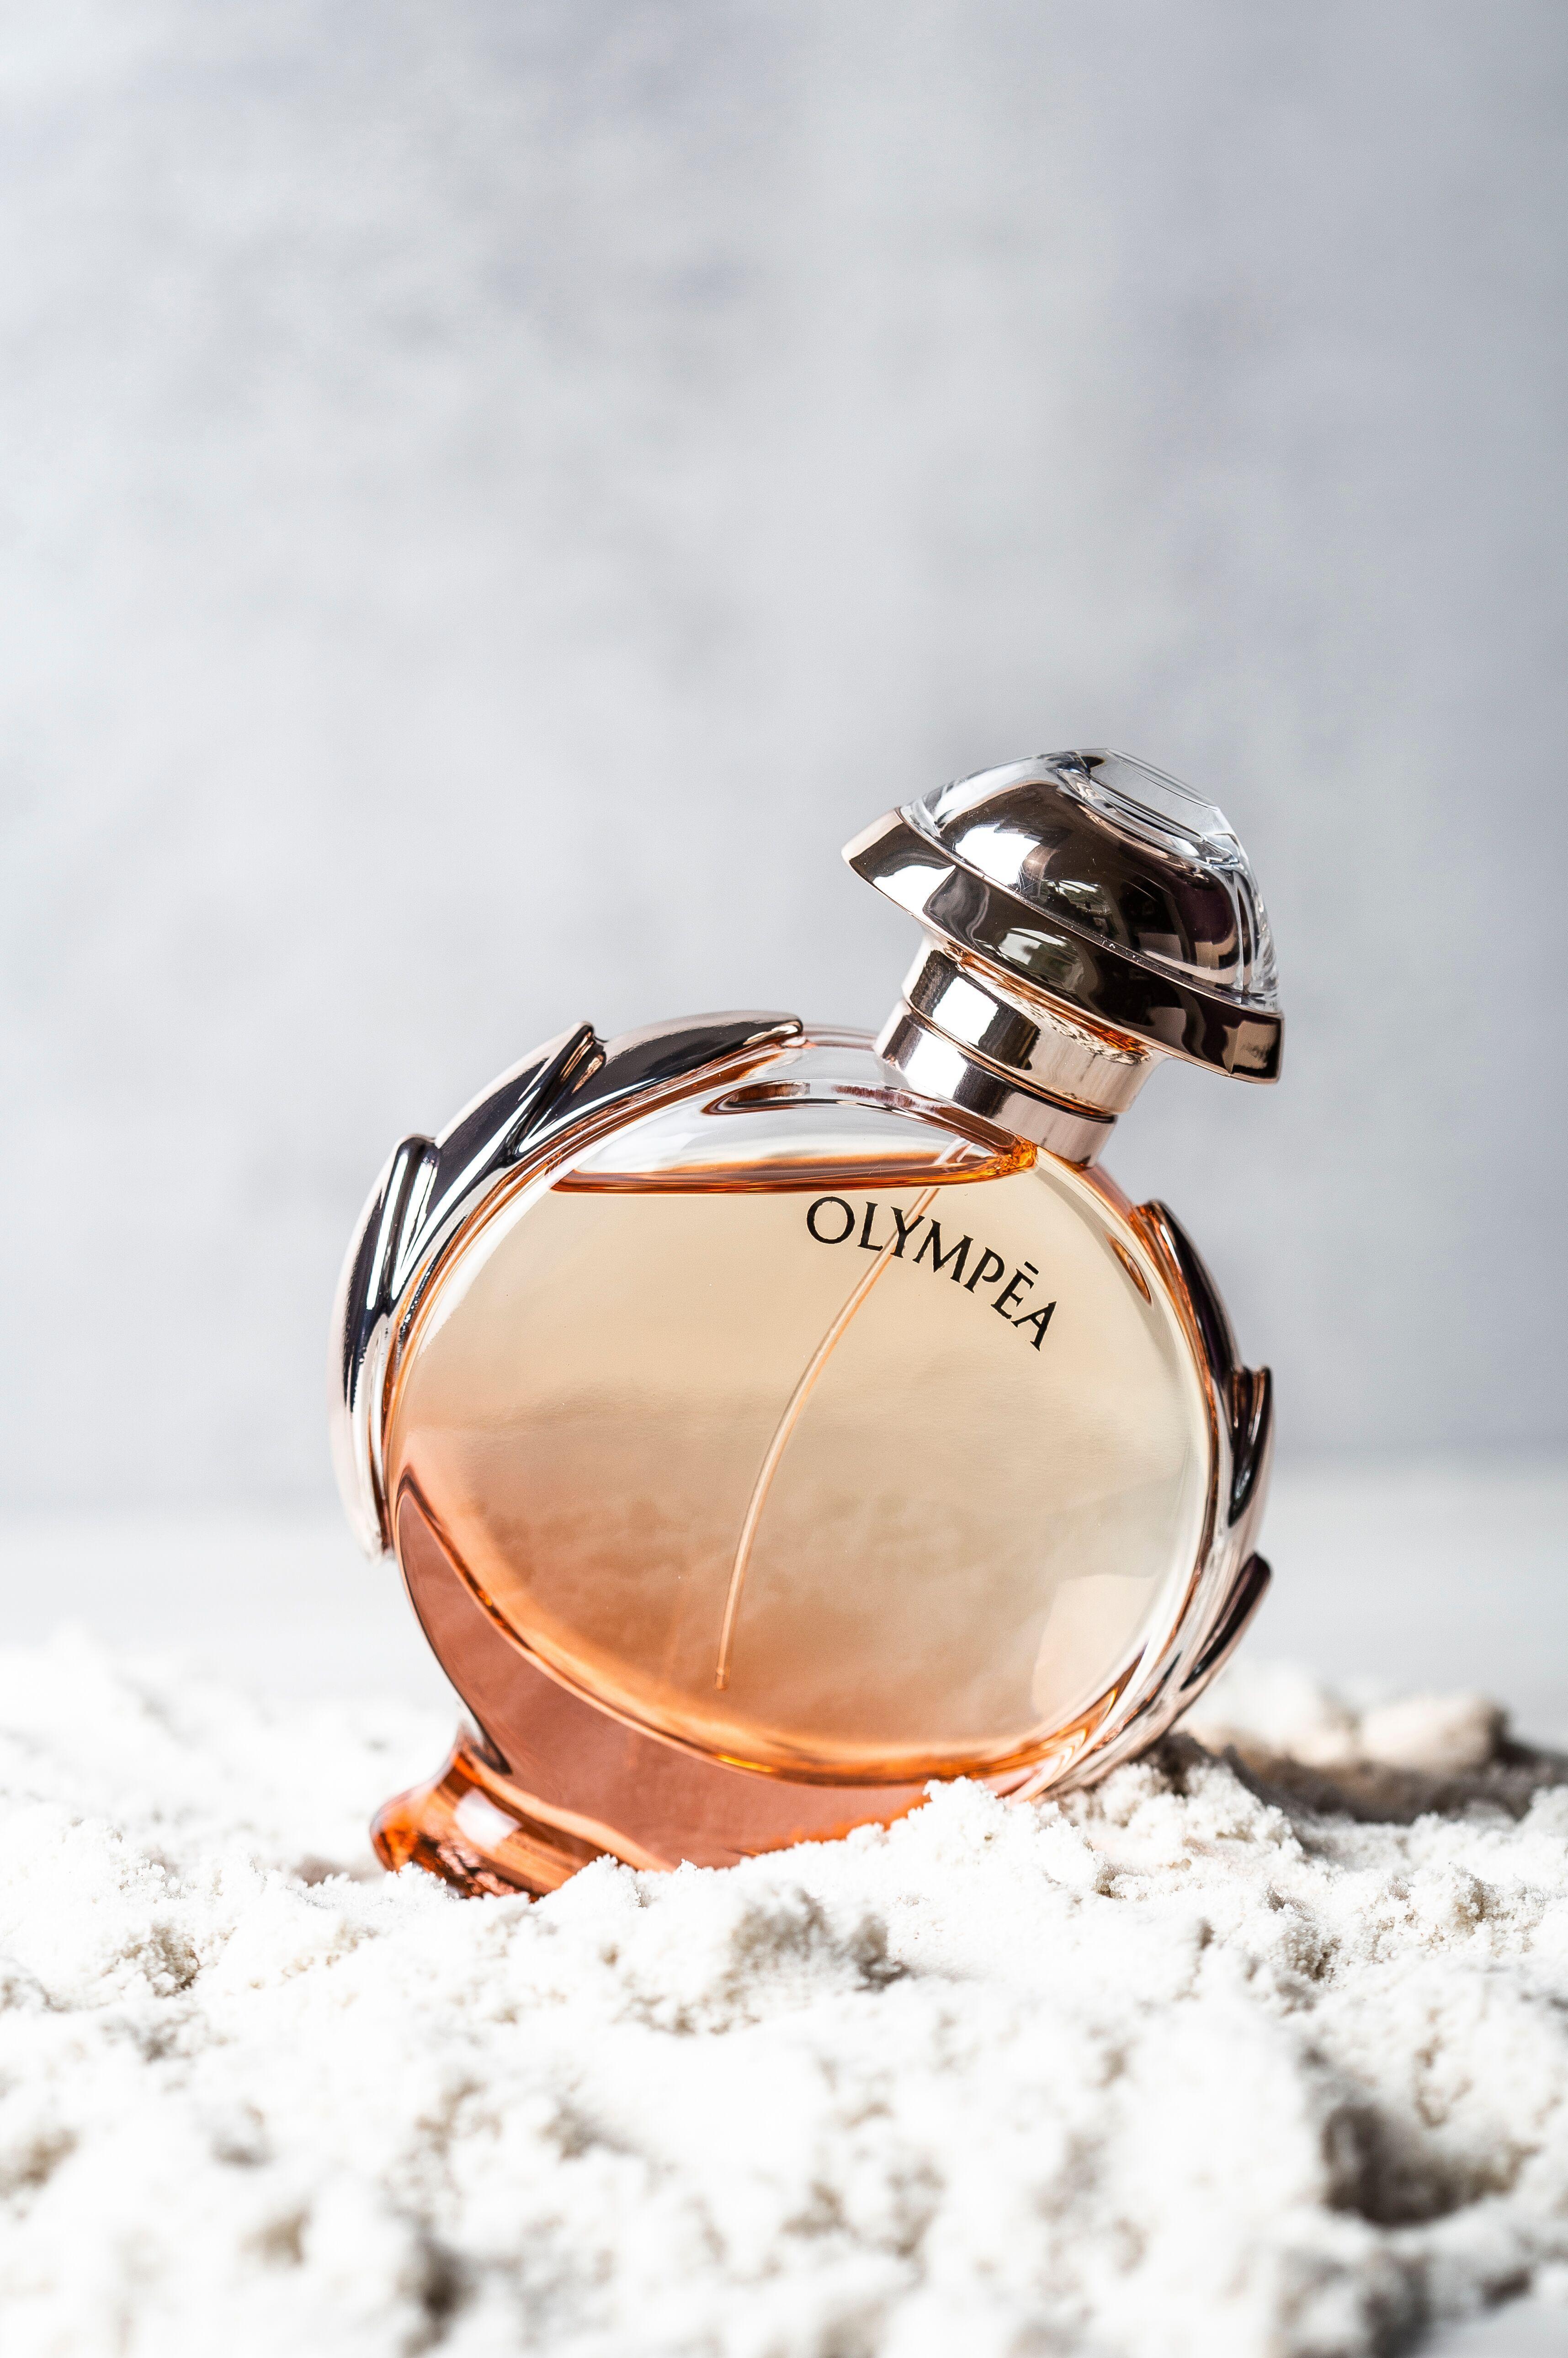 Olympea Intense Gift Set Eau De Parfum